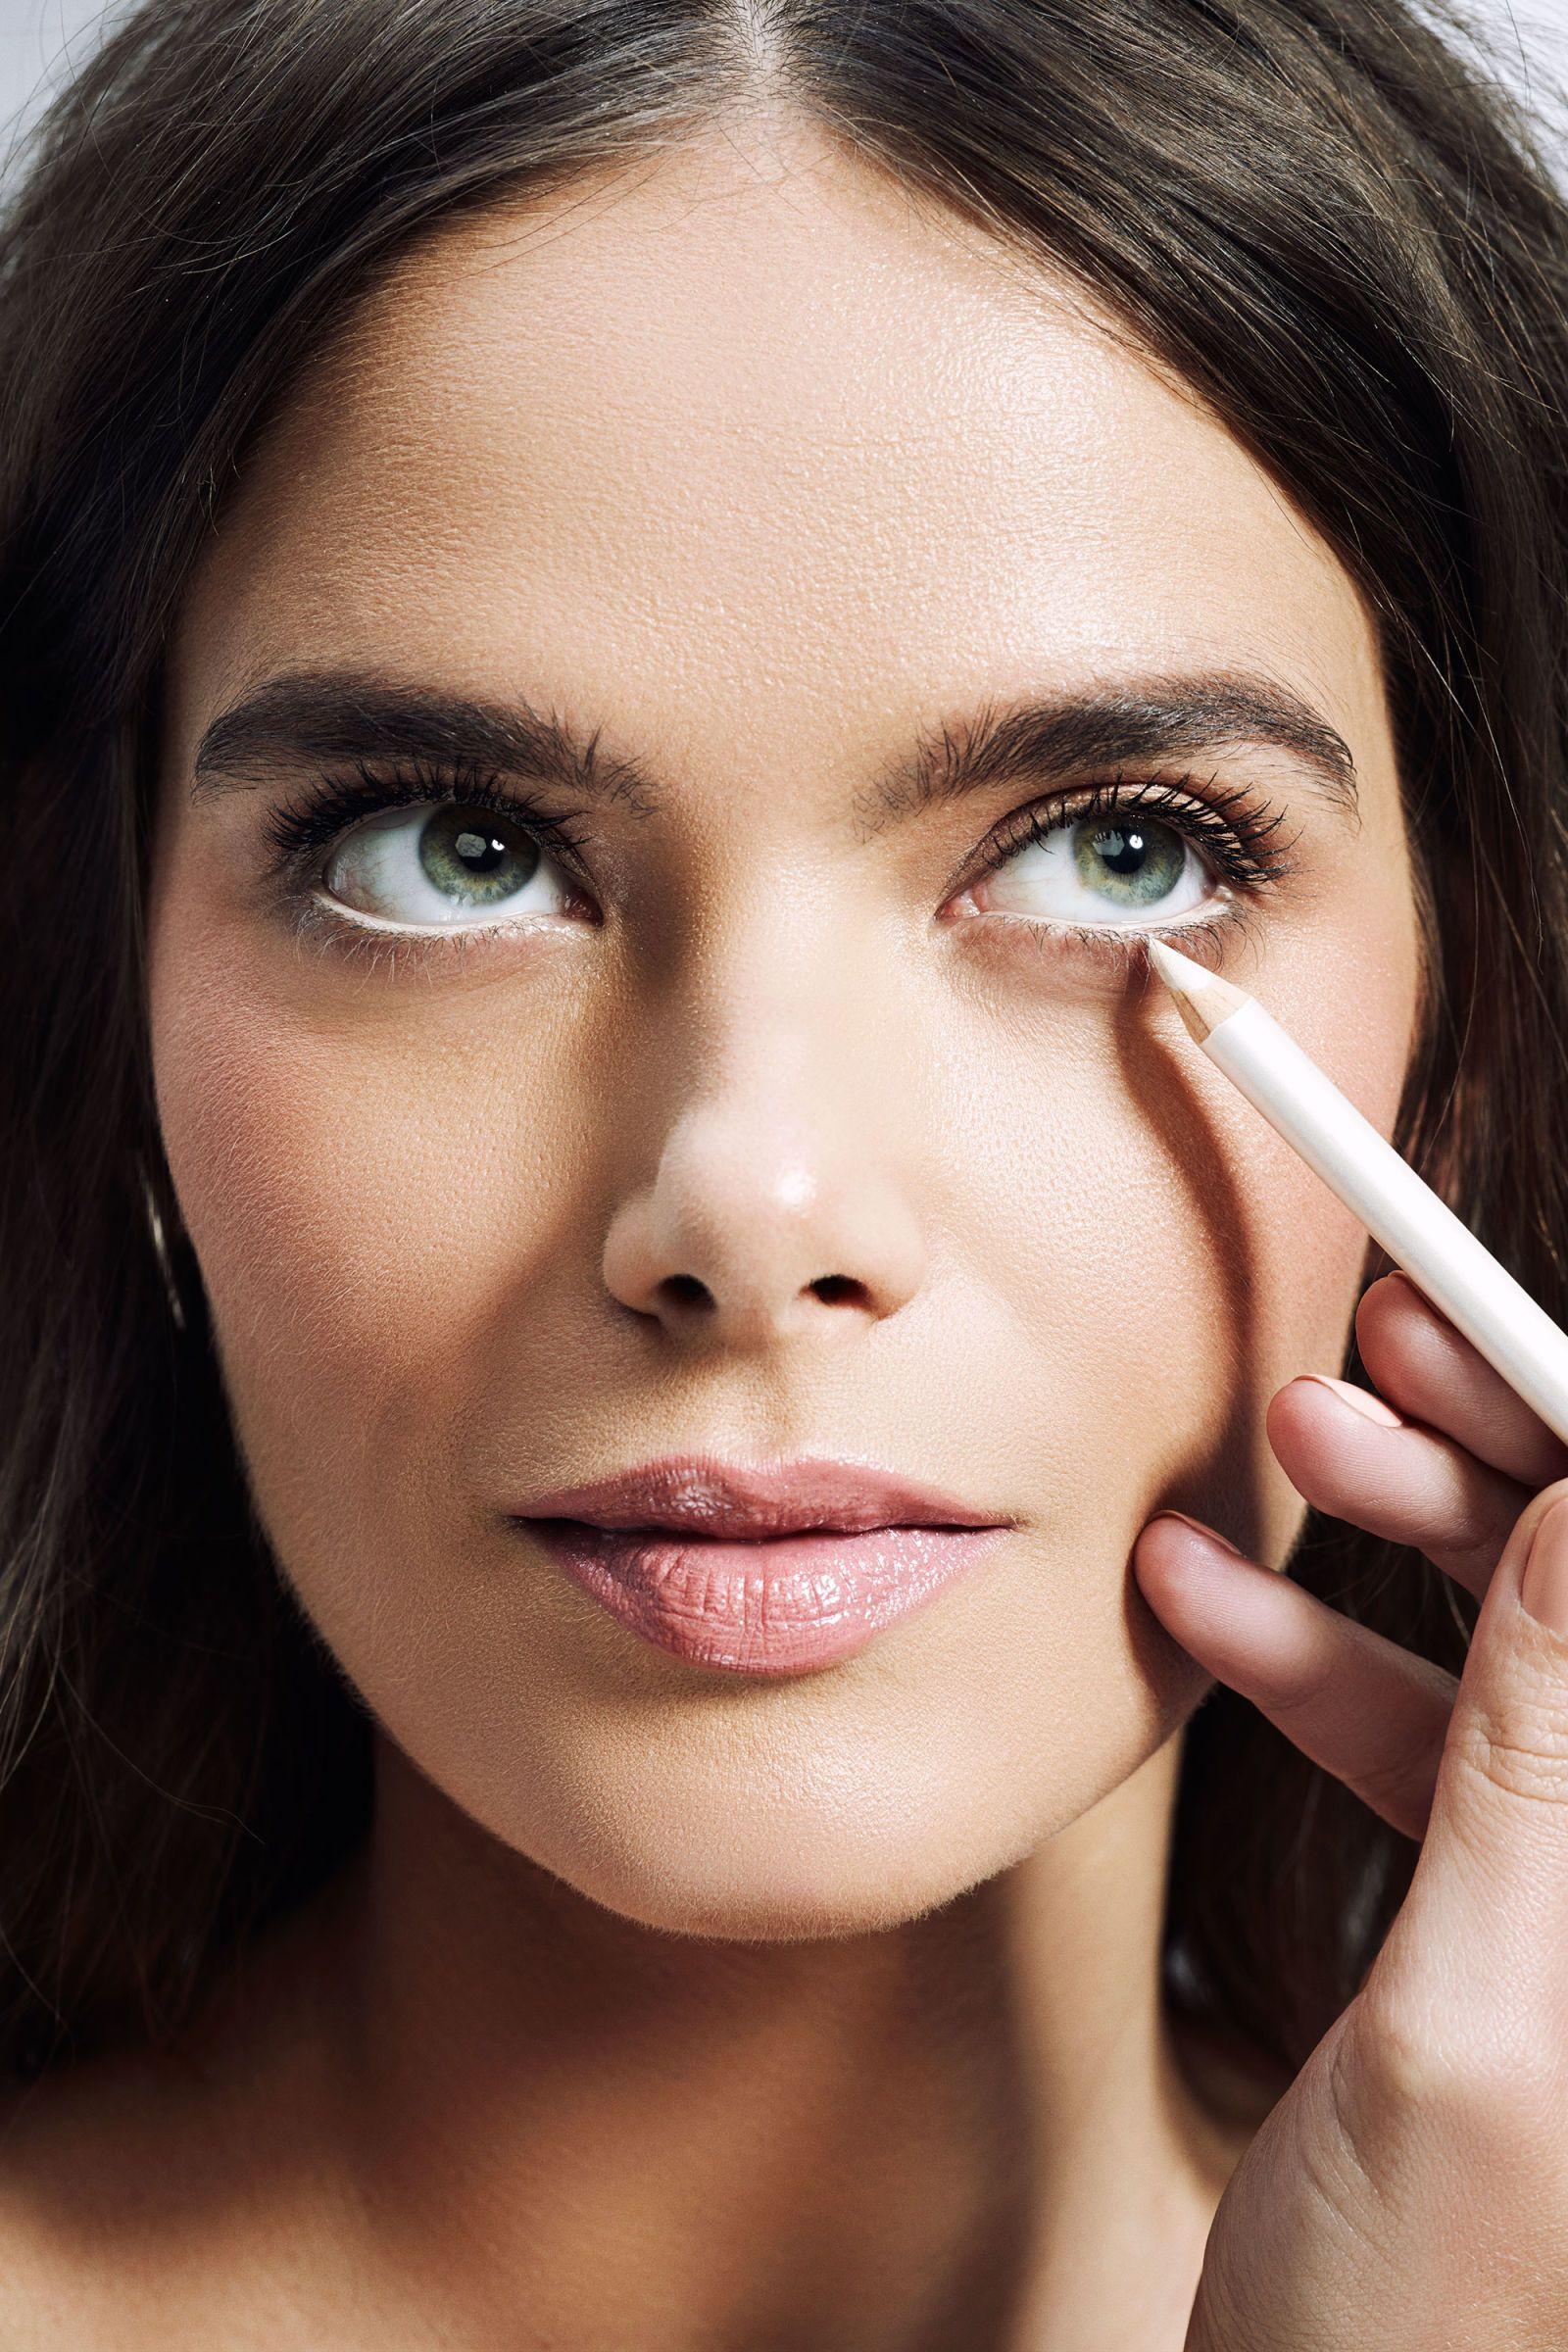 5 Makeup Tricks To Make Your Eyes Look Bigger Con Imagenes